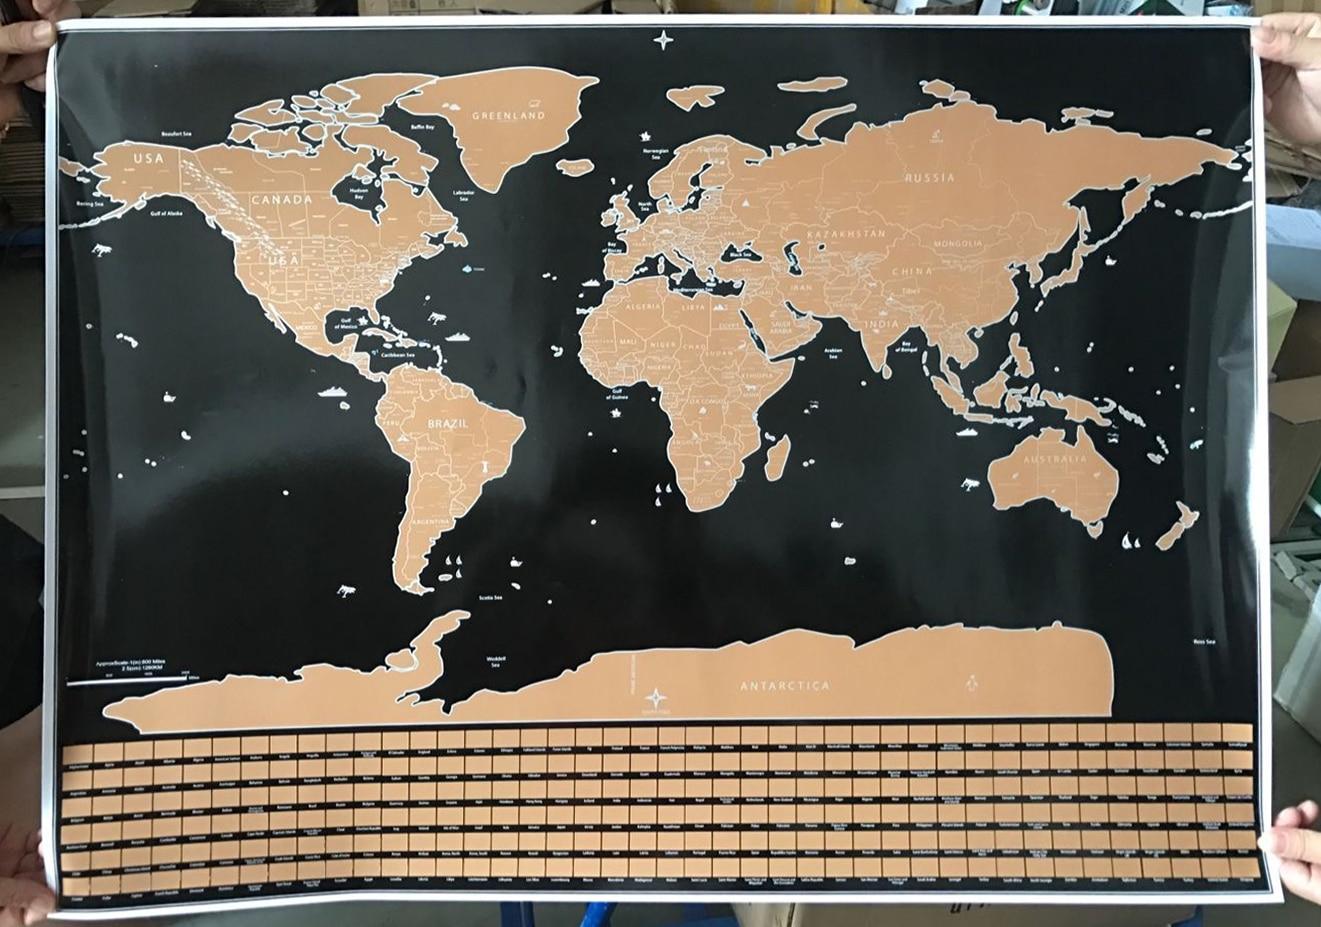 Promocin de europa mapa de pared 3d compra europa mapa de pared 1 unids nueva llegada deluxe rascar mapa mundial personalizada bandera de mapa de scratch scratch off para viajes gumiabroncs Images